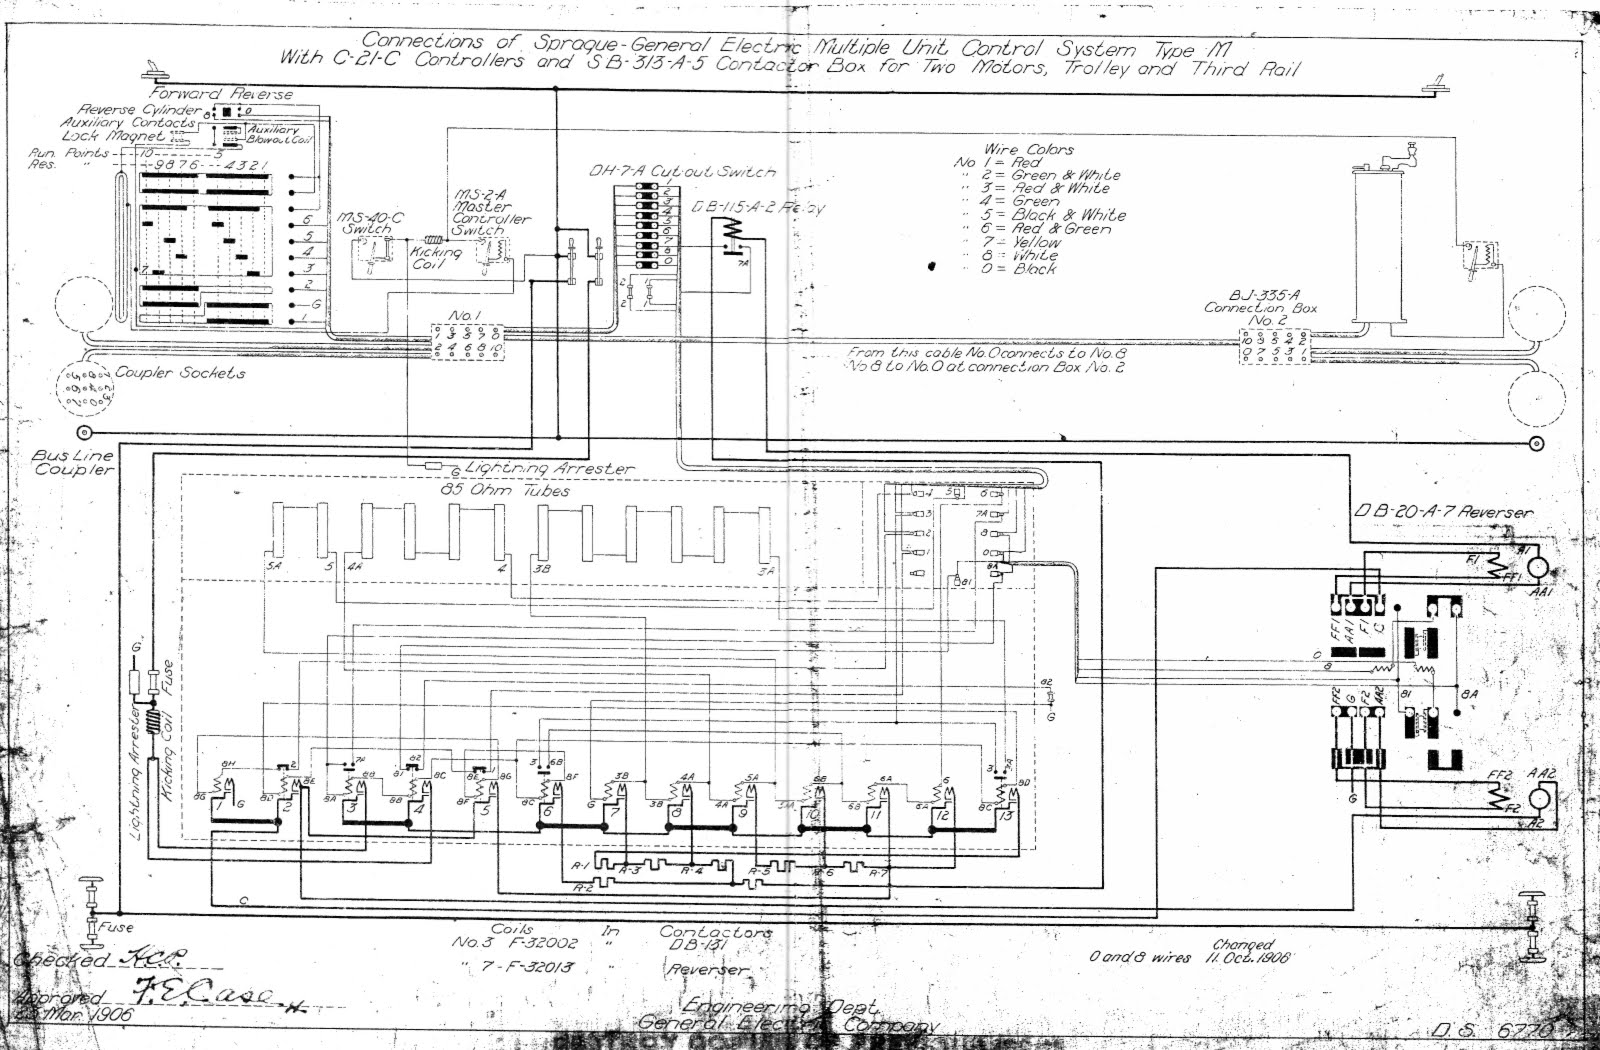 chevy chevette engine diagram html